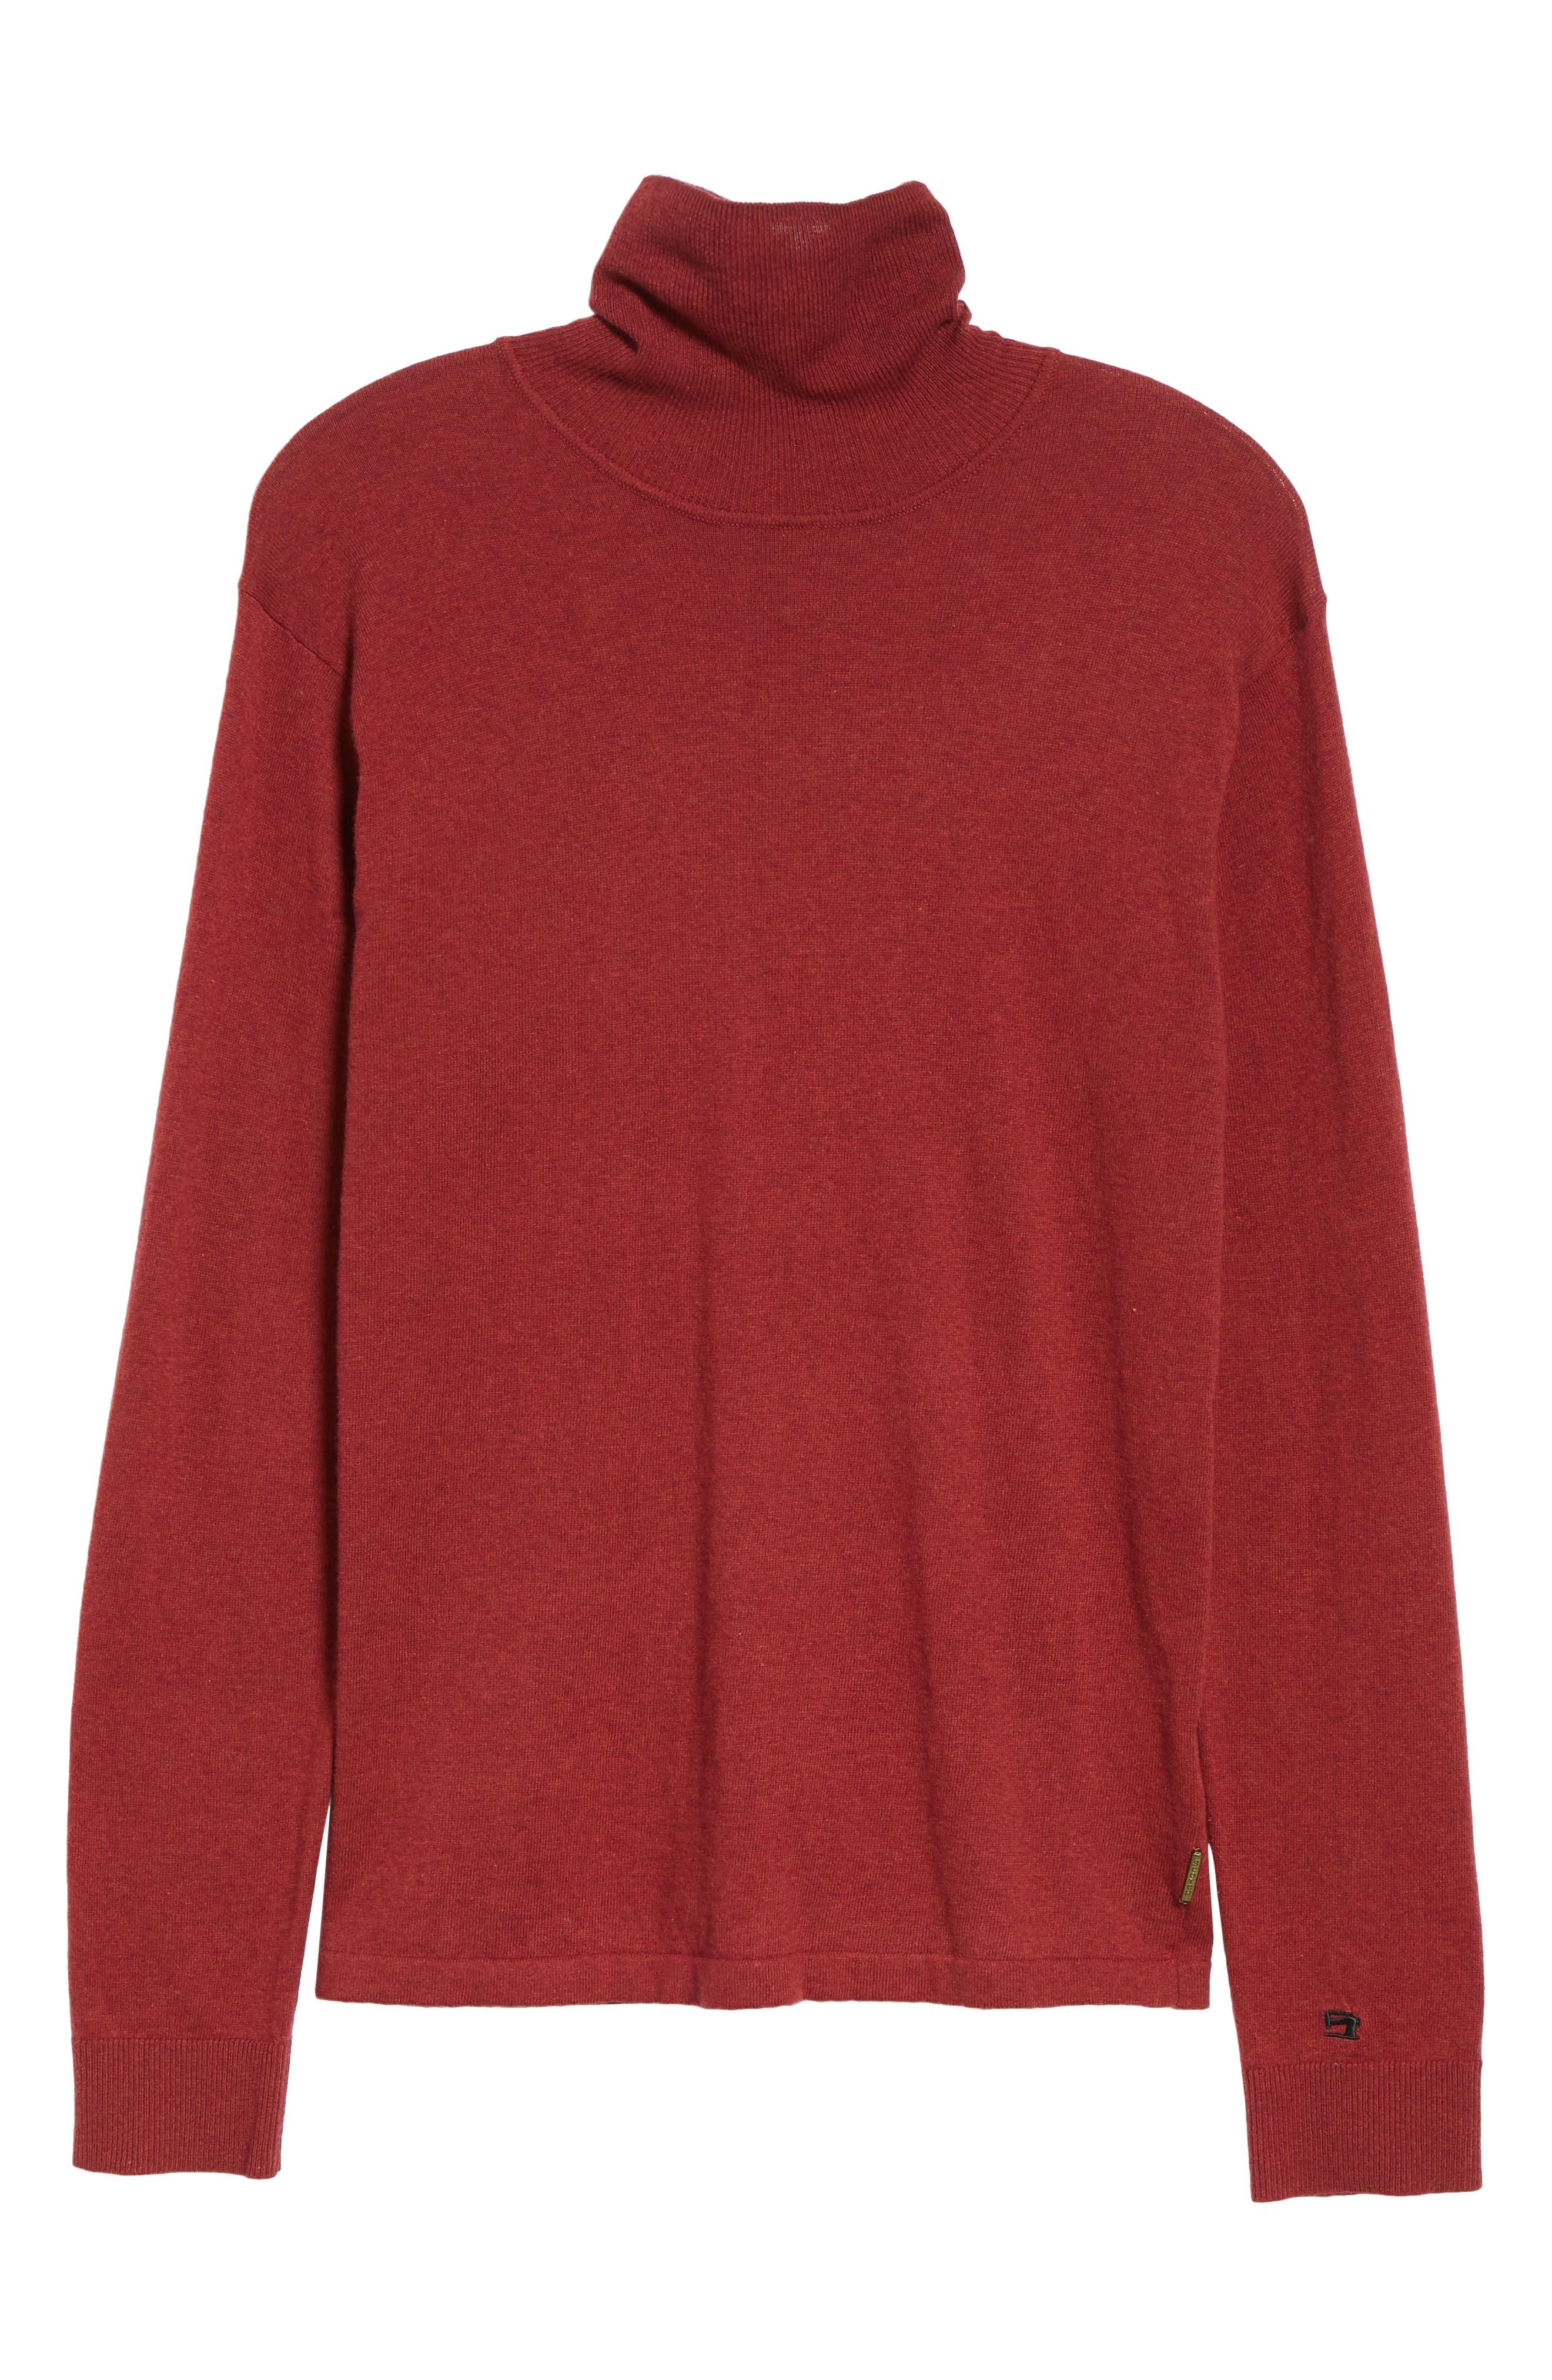 Turtleneck Sweater,                             Alternate thumbnail 6, color,                             610